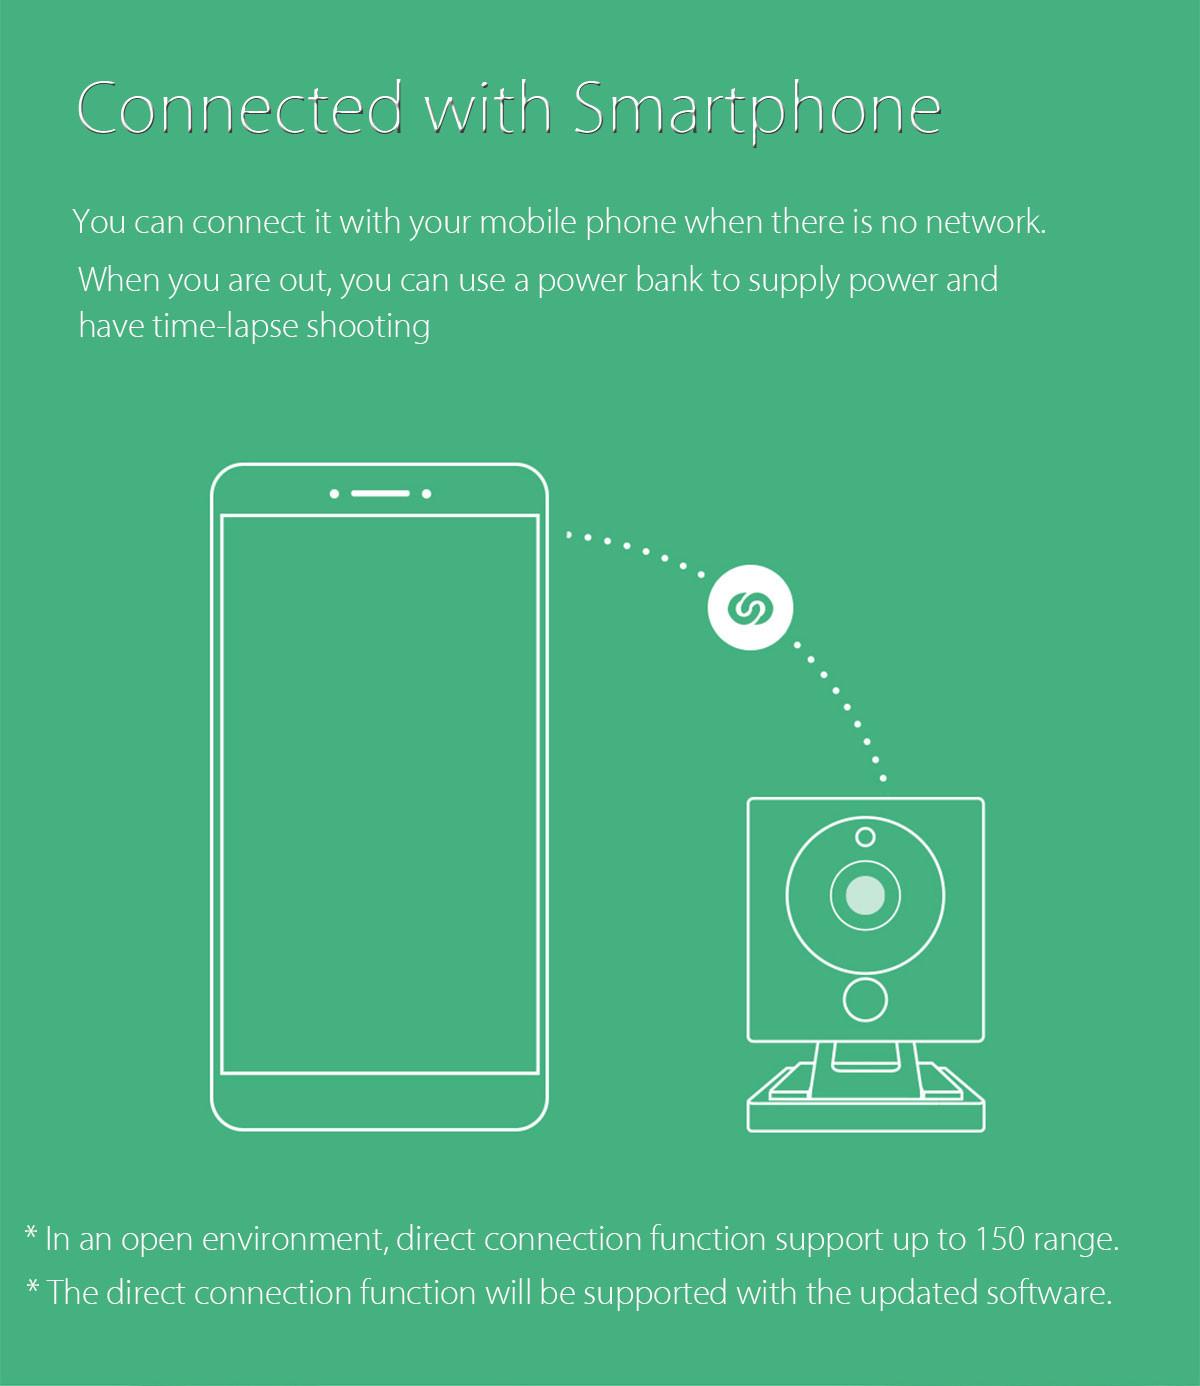 Xiaomi Xiaofang 1080p Portable Smart Ip Camera Wifi Cctv With Night Vision